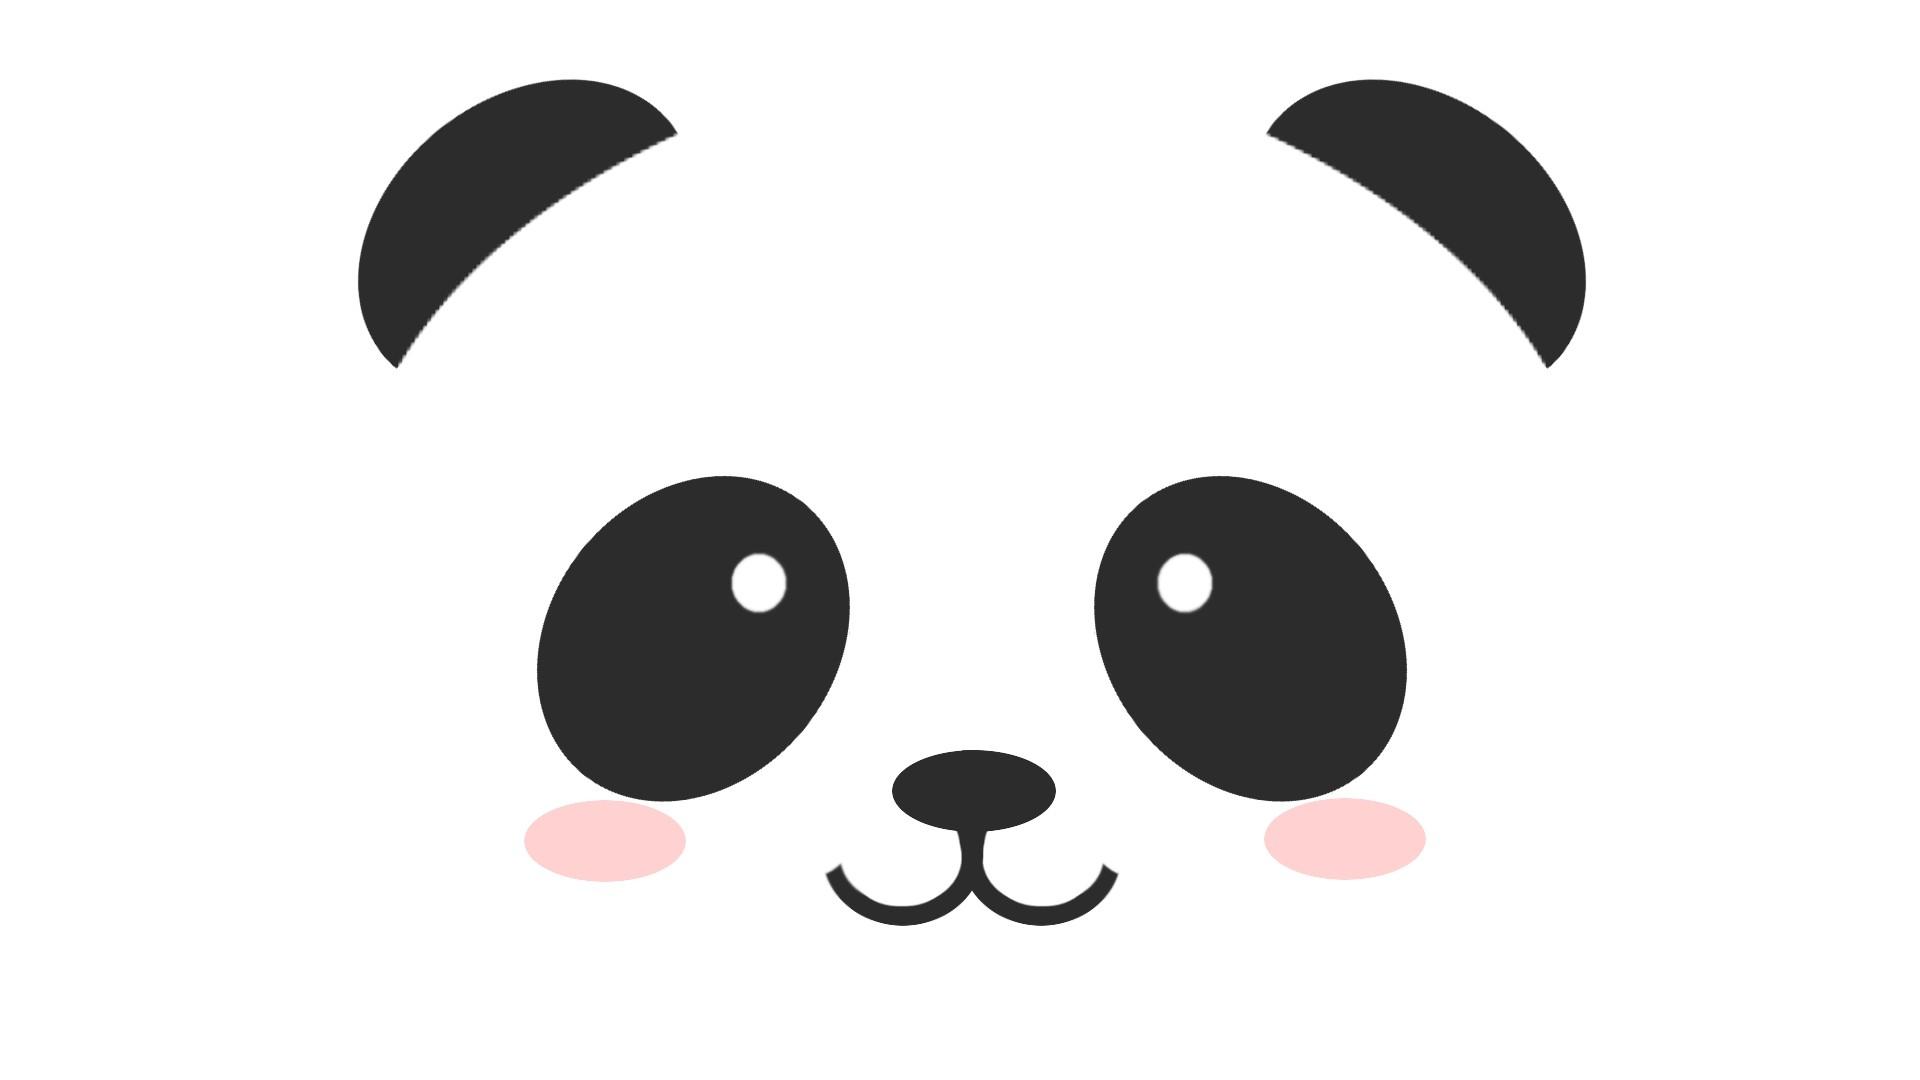 Res: 1920x1080, Panda wallpapers HD free download.